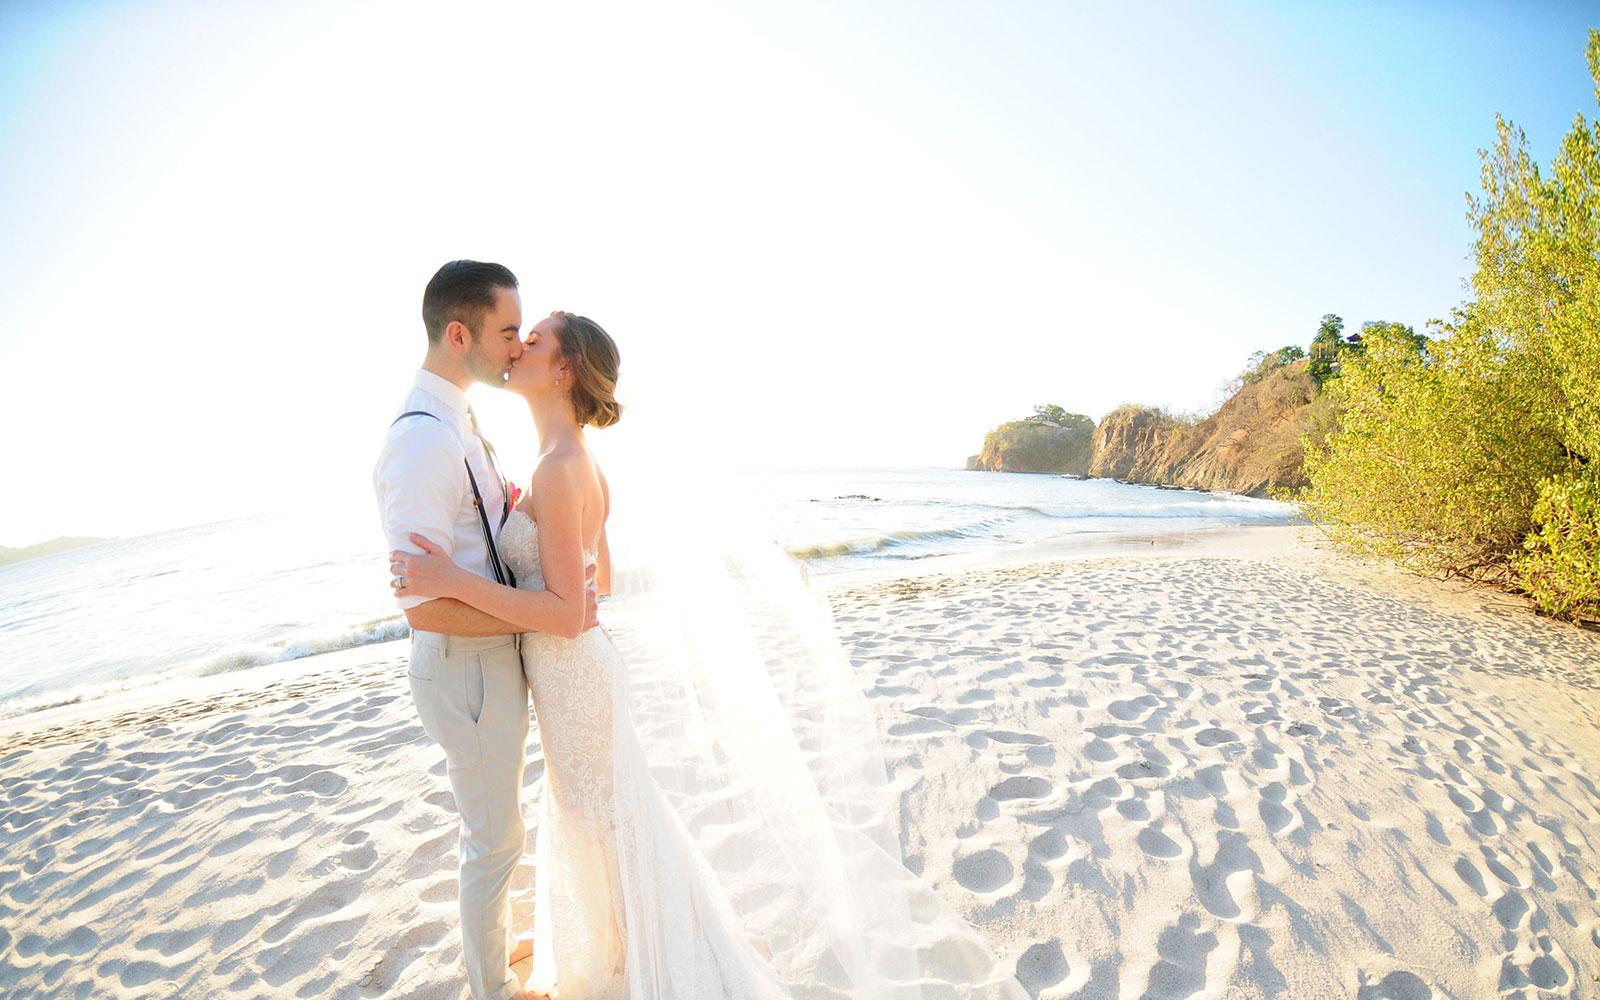 Cost Rica Beach Resort Wedding & Events Facilities